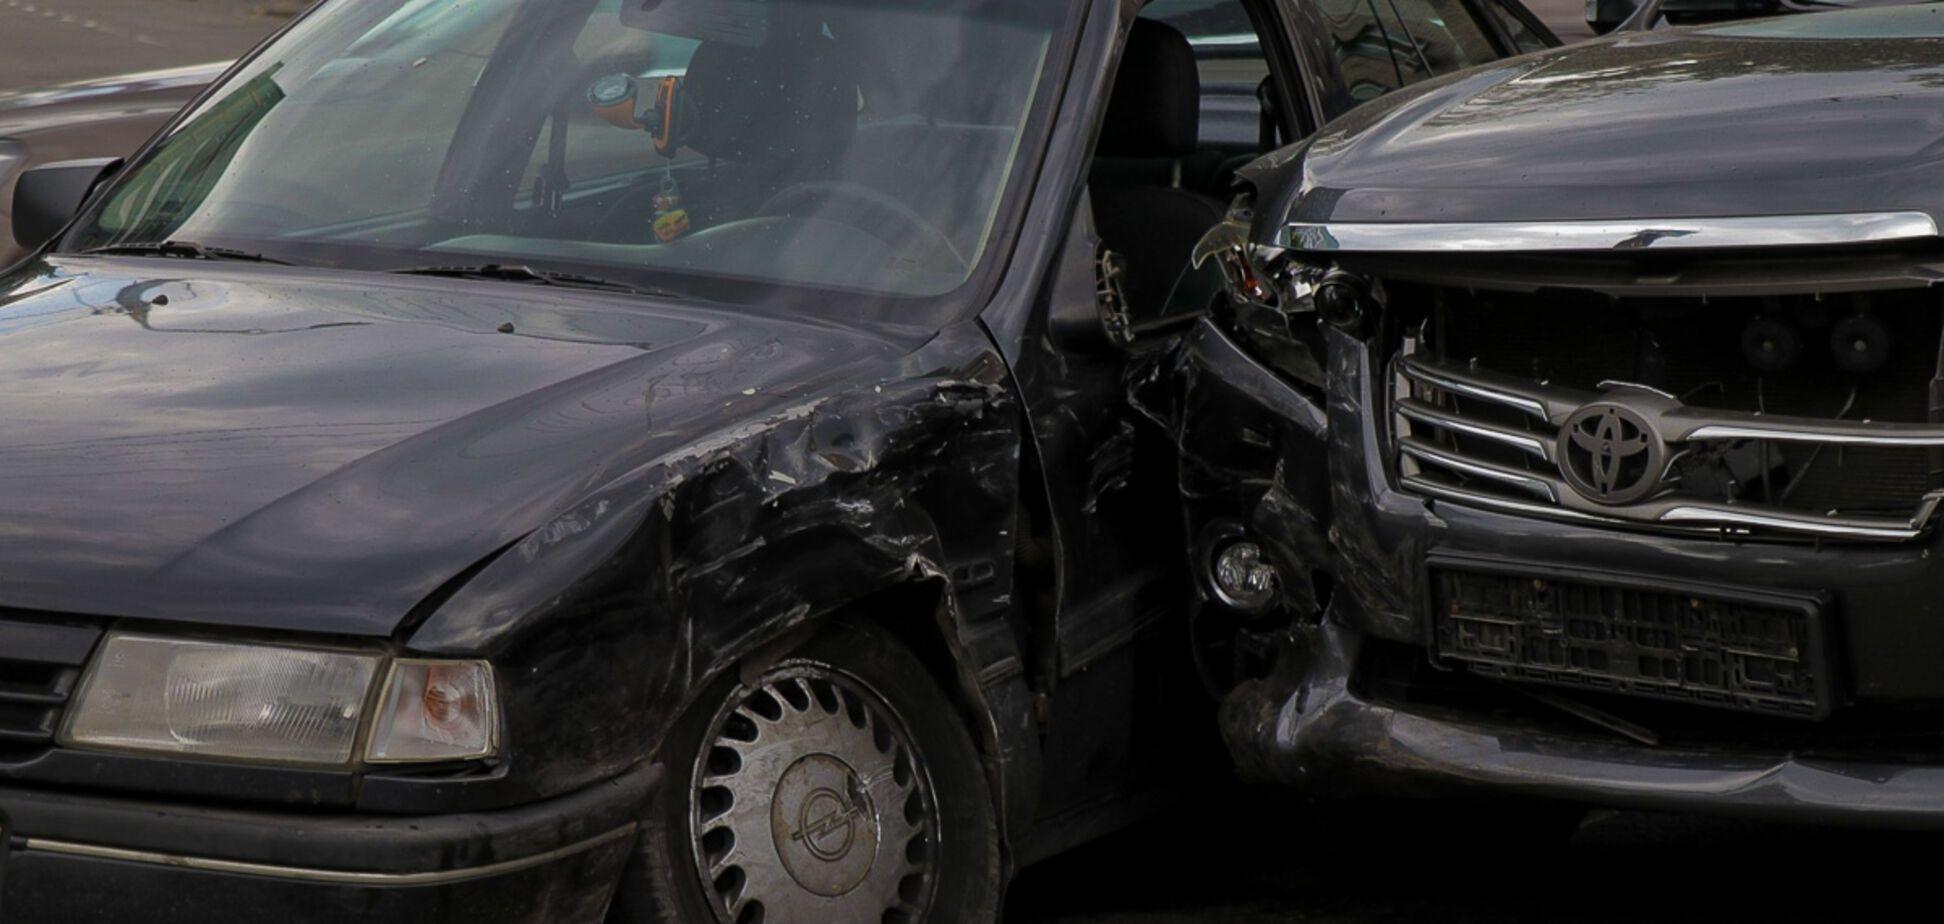 В Днепре на перекрестке столкнулись две легковушки: пострадали водители